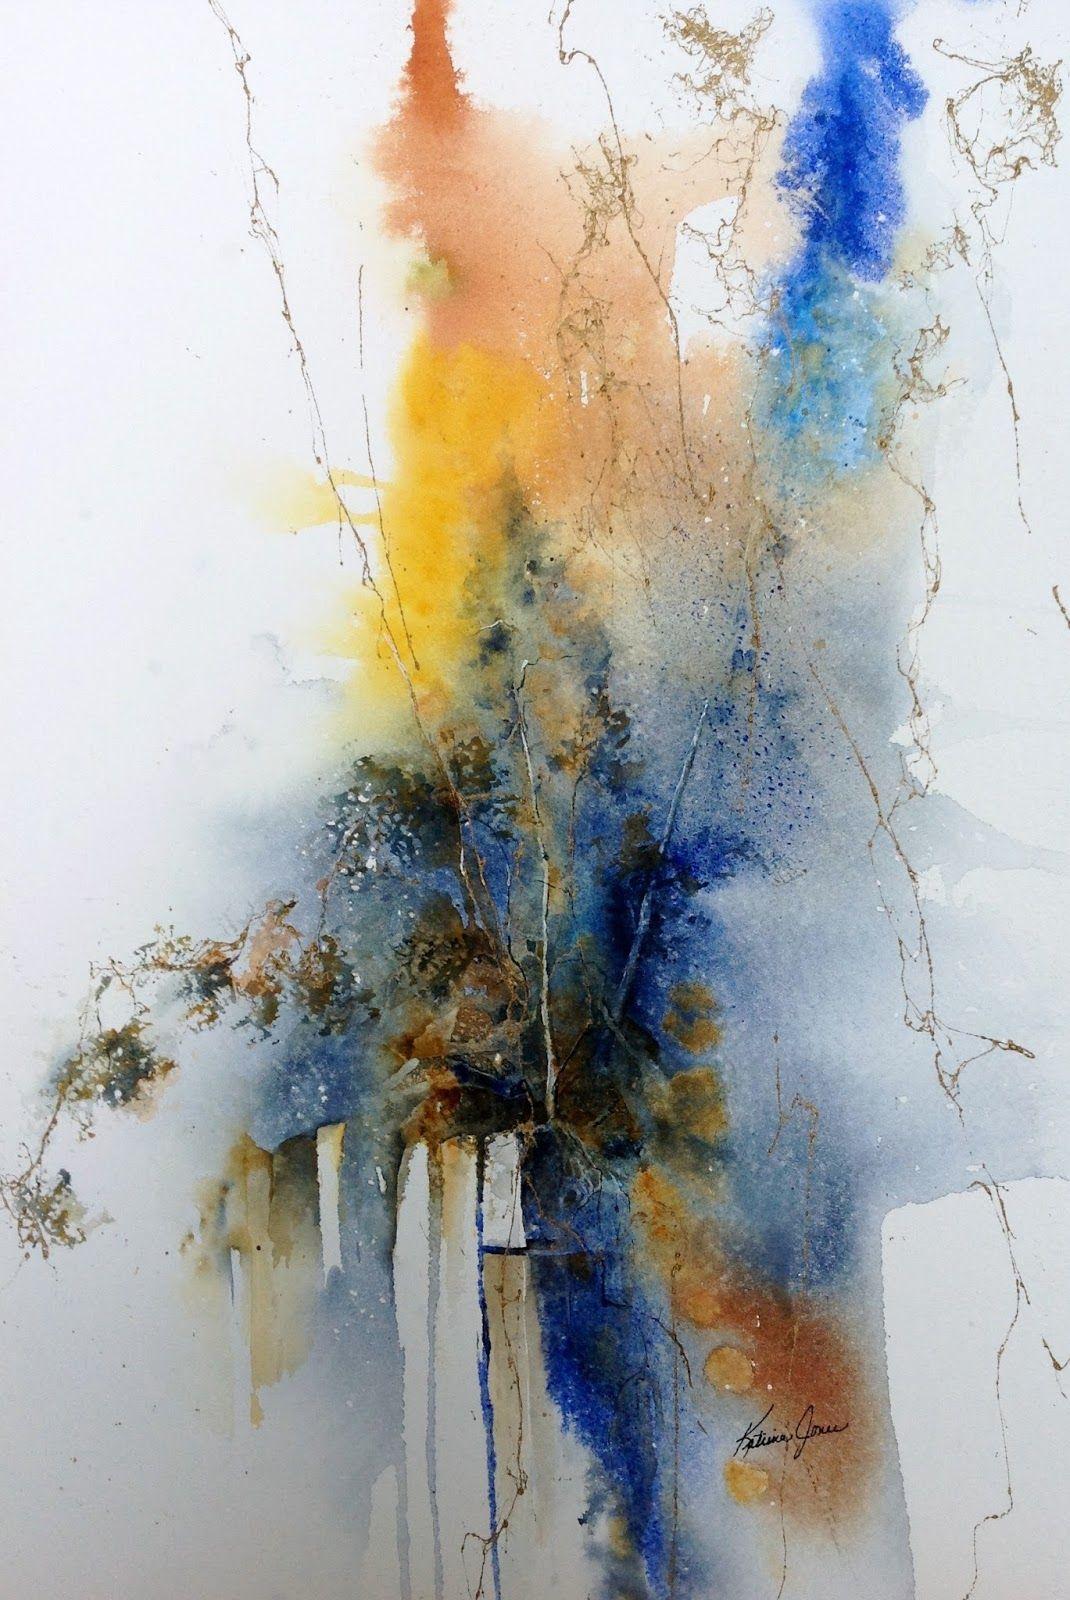 And So I Paint | Aquarelle abstraite, Peinture abstraite, Toile abstraite